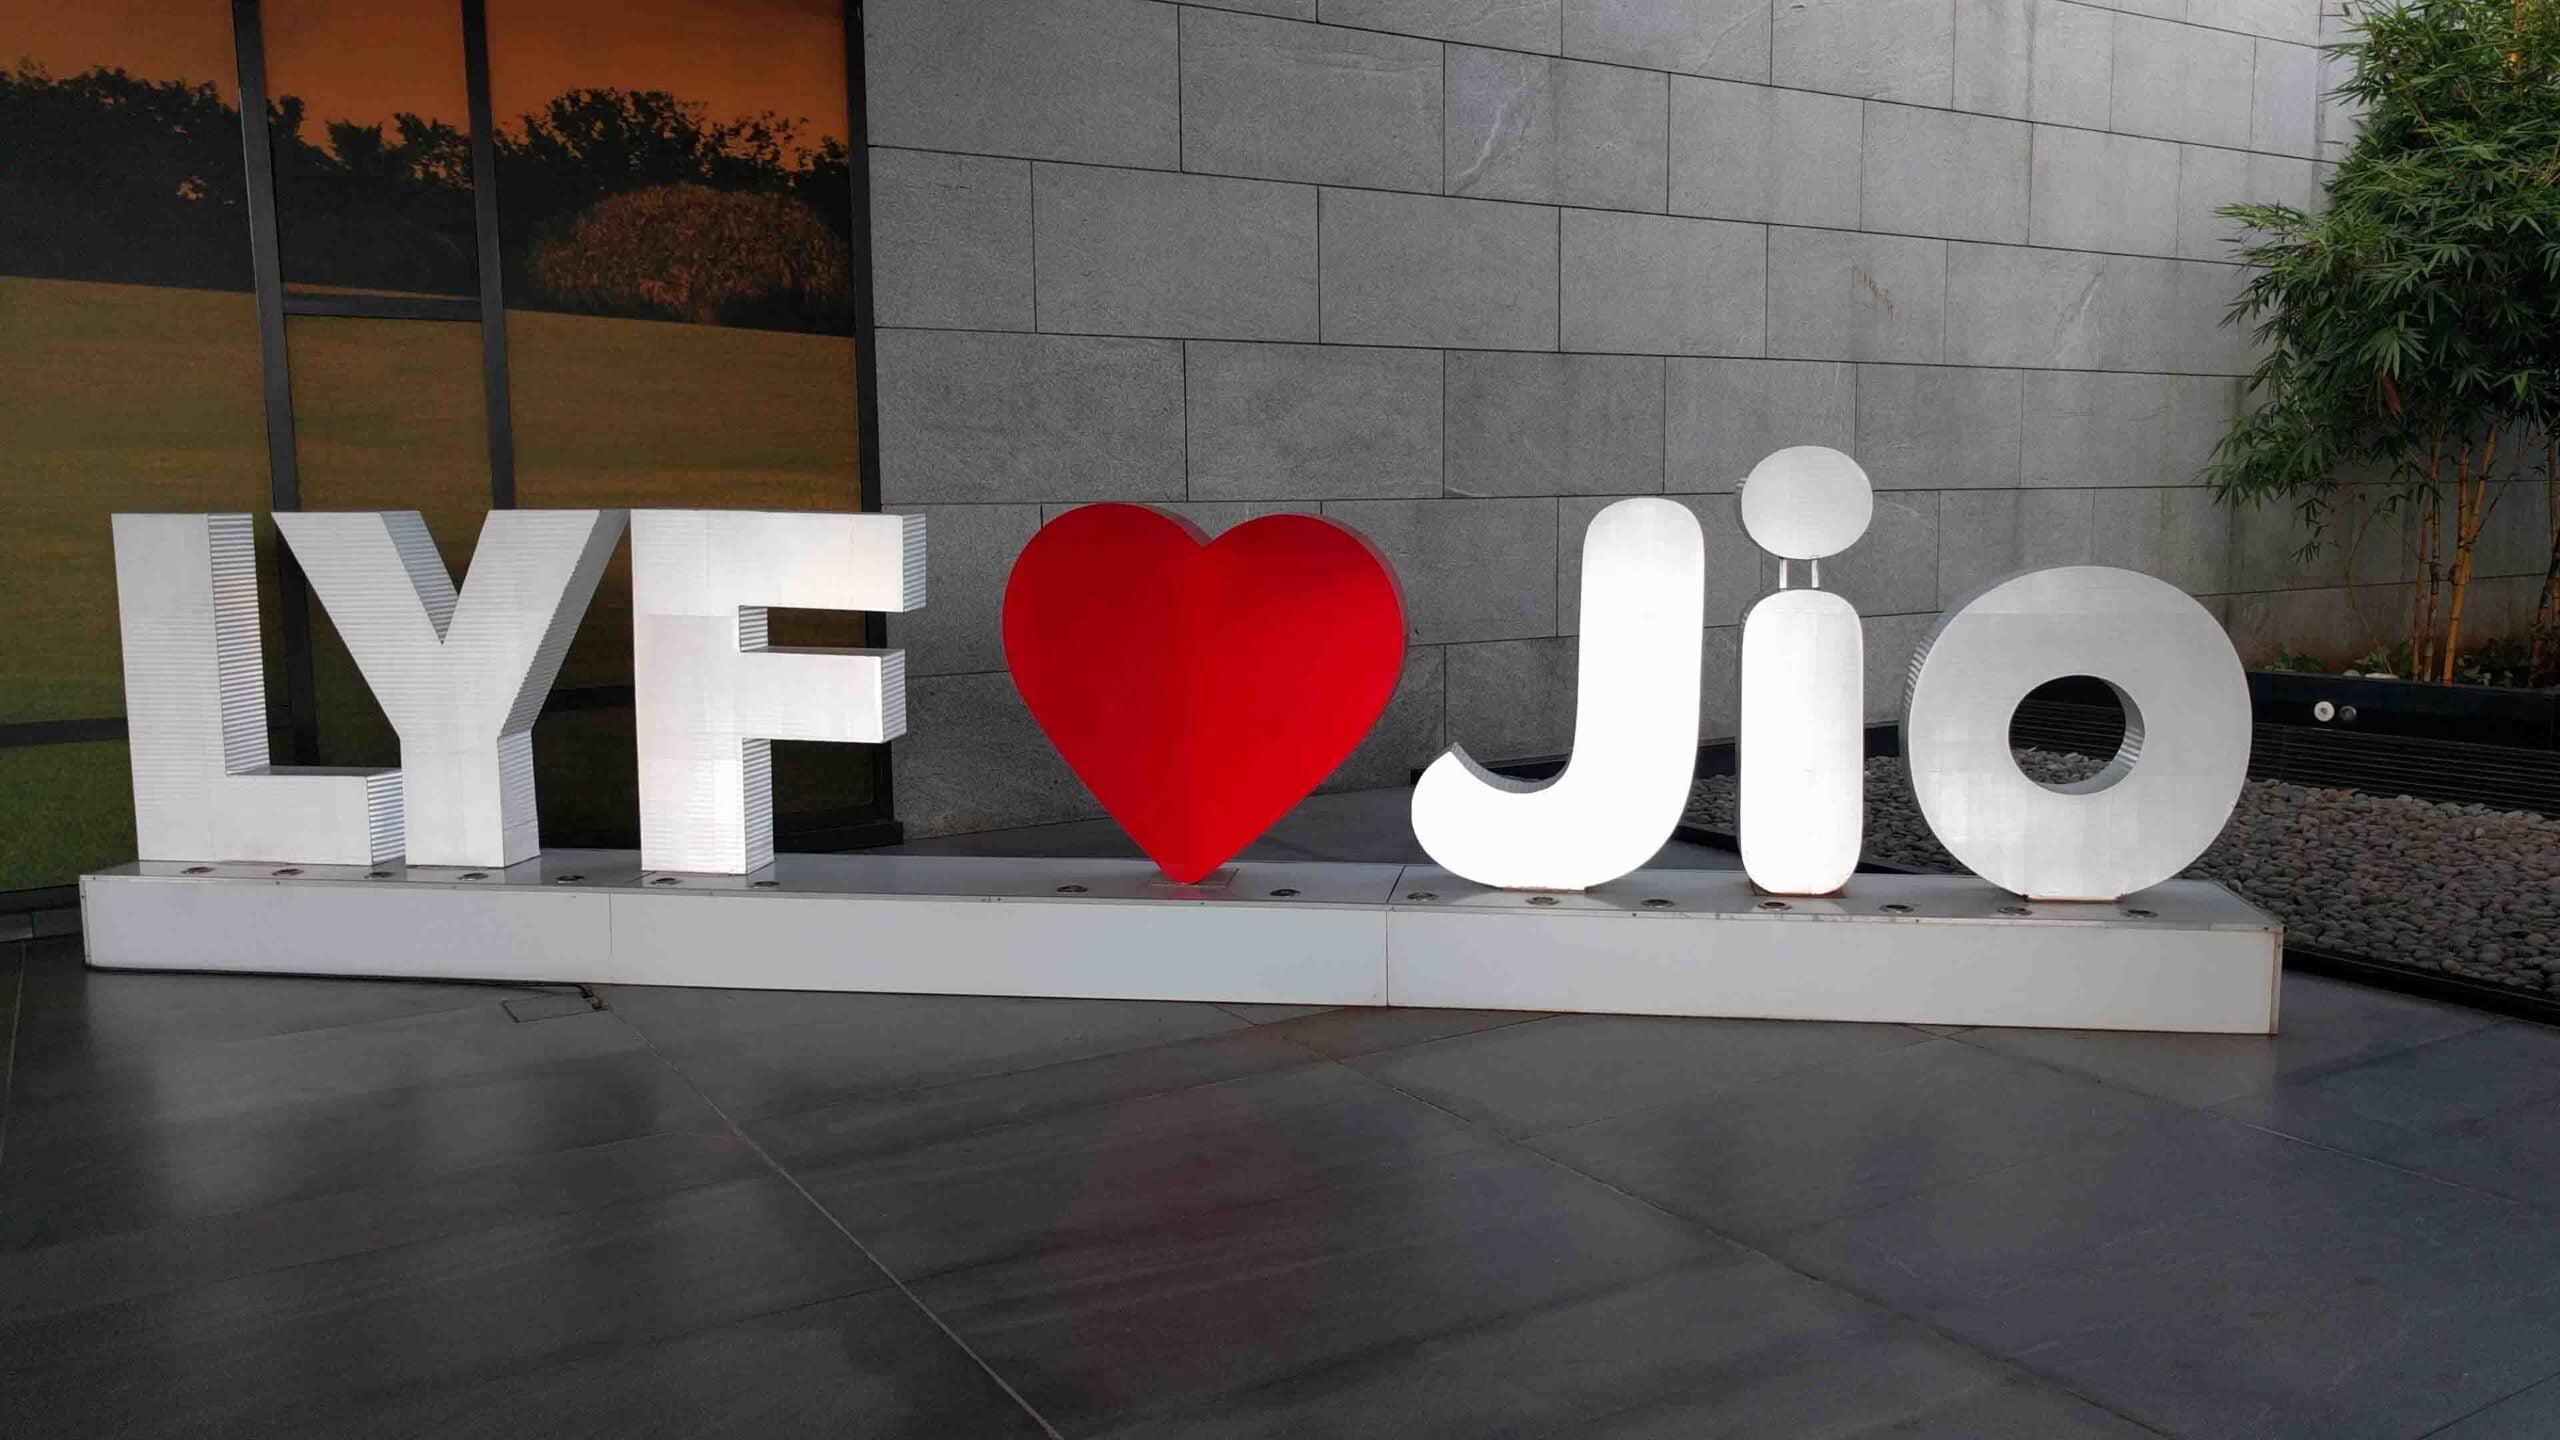 LYF Jio scaled